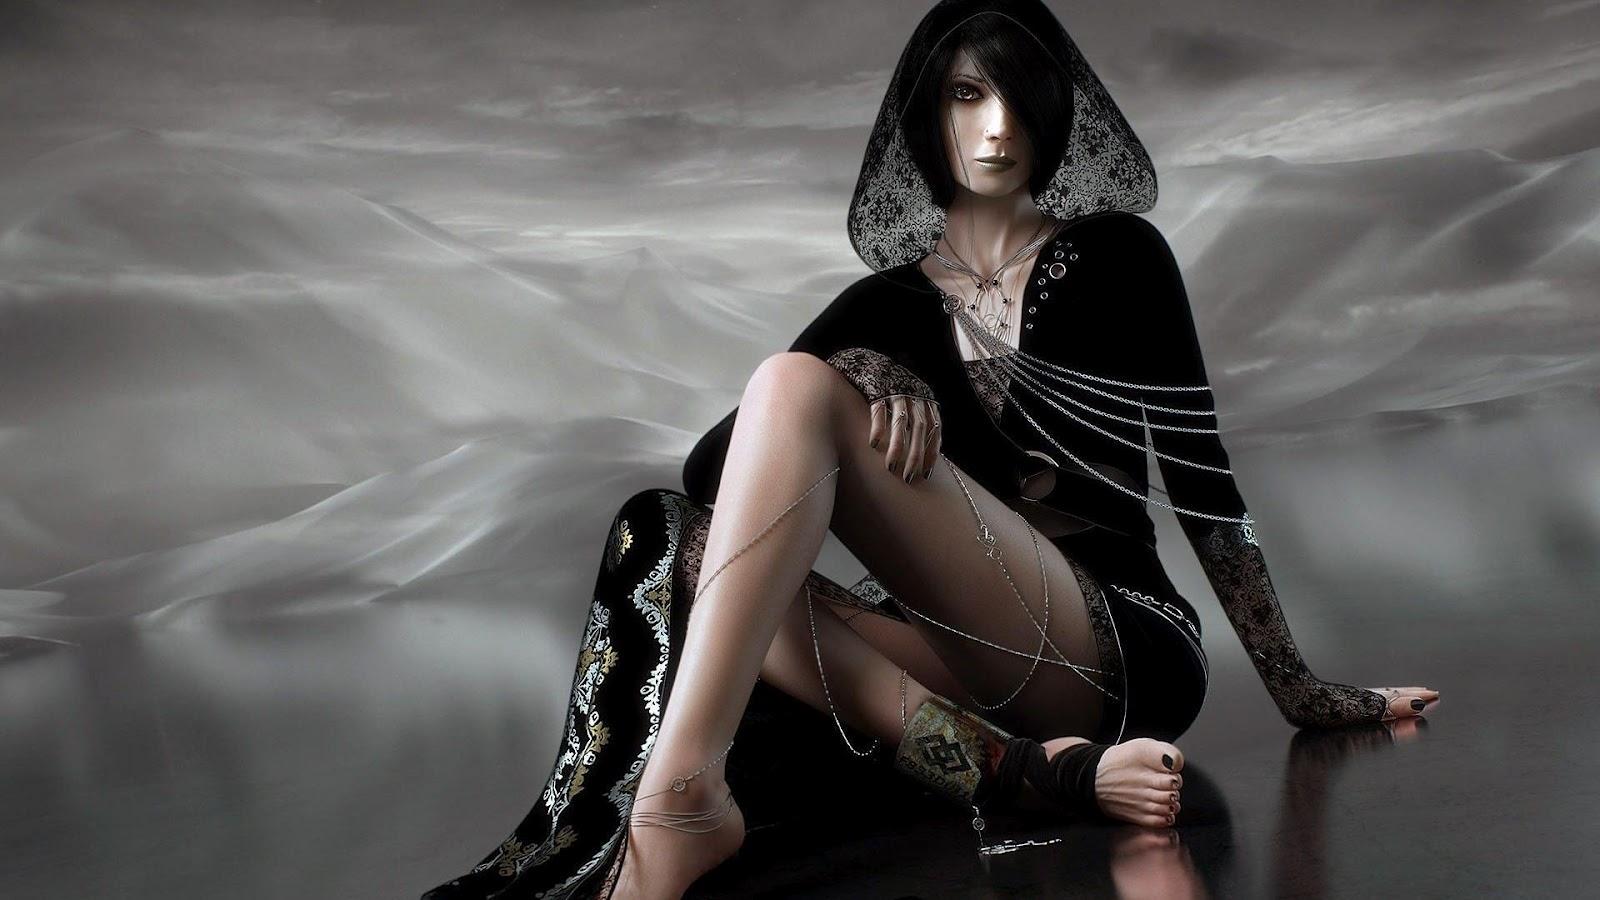 http://1.bp.blogspot.com/-sf67XqmO6Ik/UBu7kjfXxKI/AAAAAAAAJcc/DLiRC99S6ag/s1600/black-widow-girl-3d-fantasy-art-1080x1920.jpg